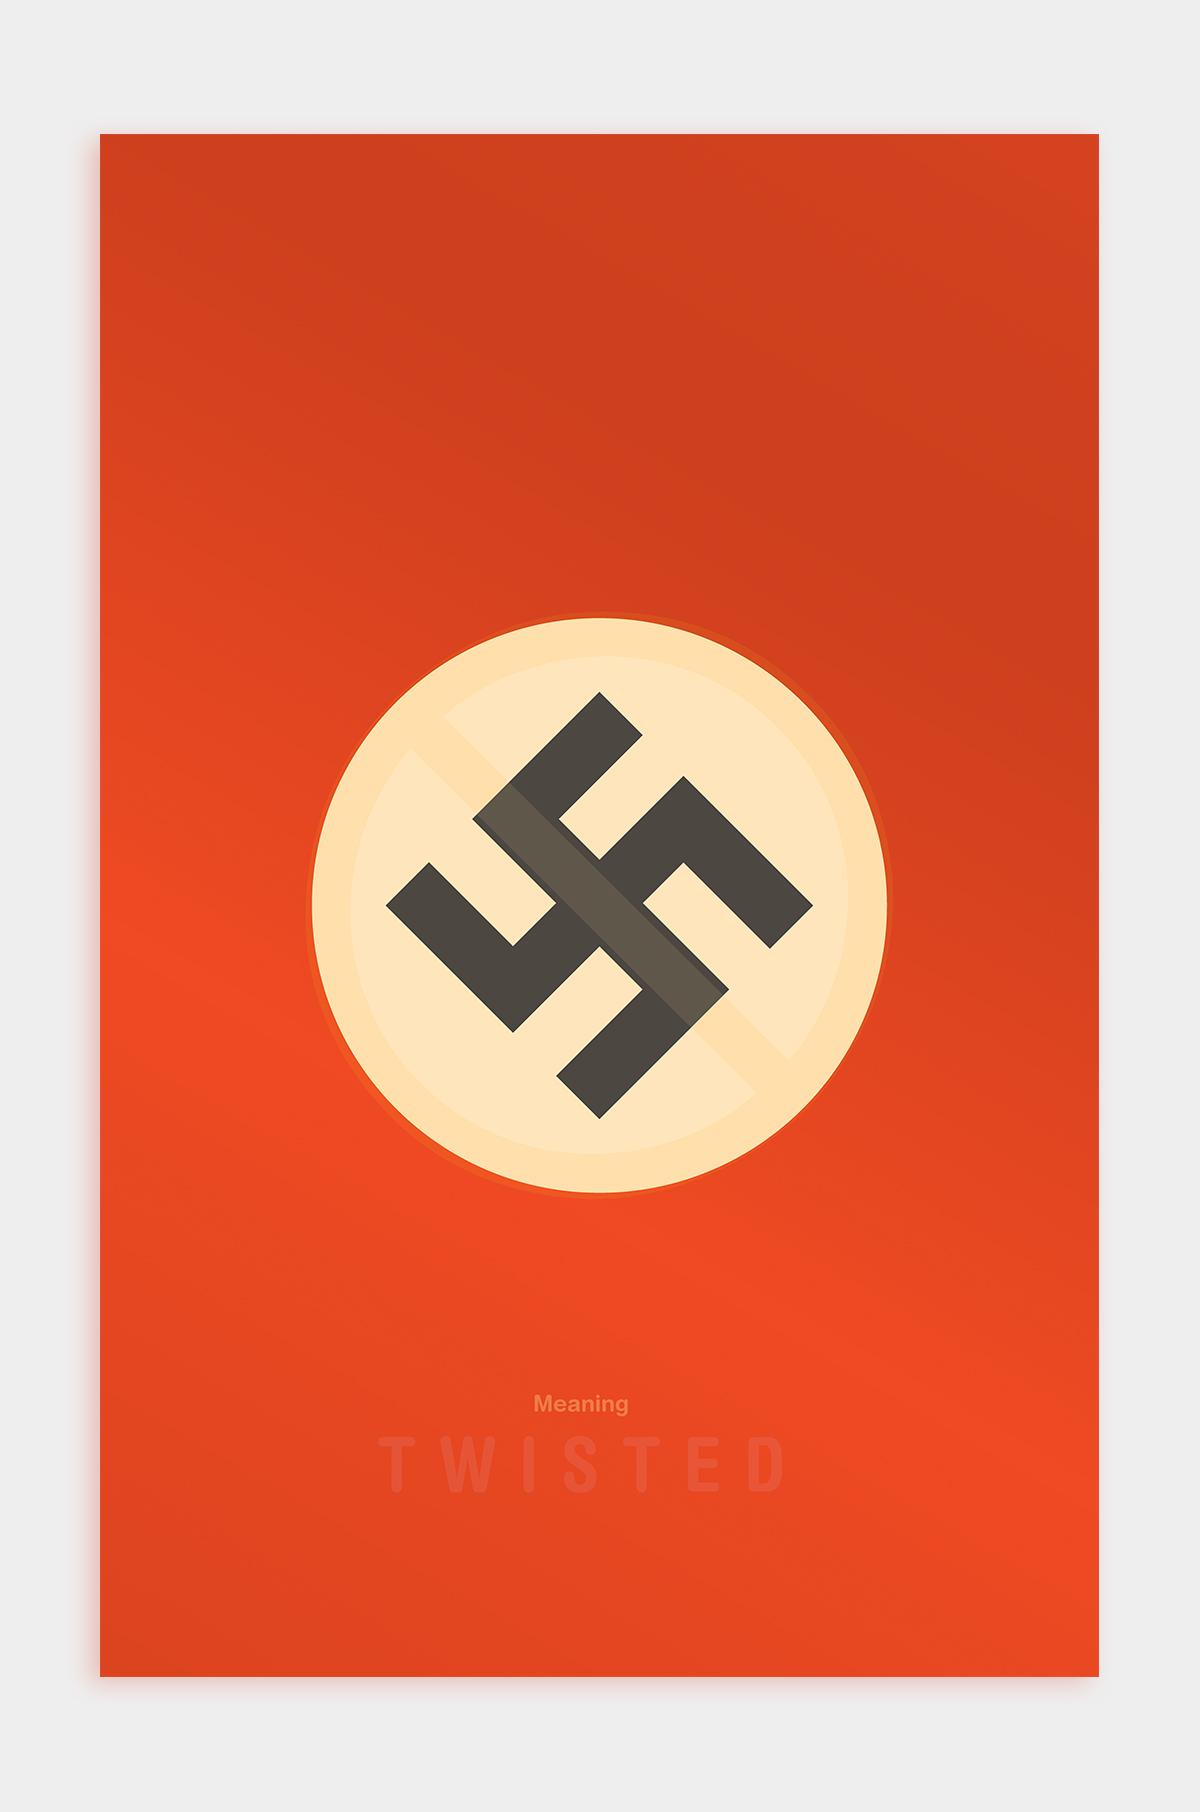 symbolism-poster-series-display-image-closeup-2